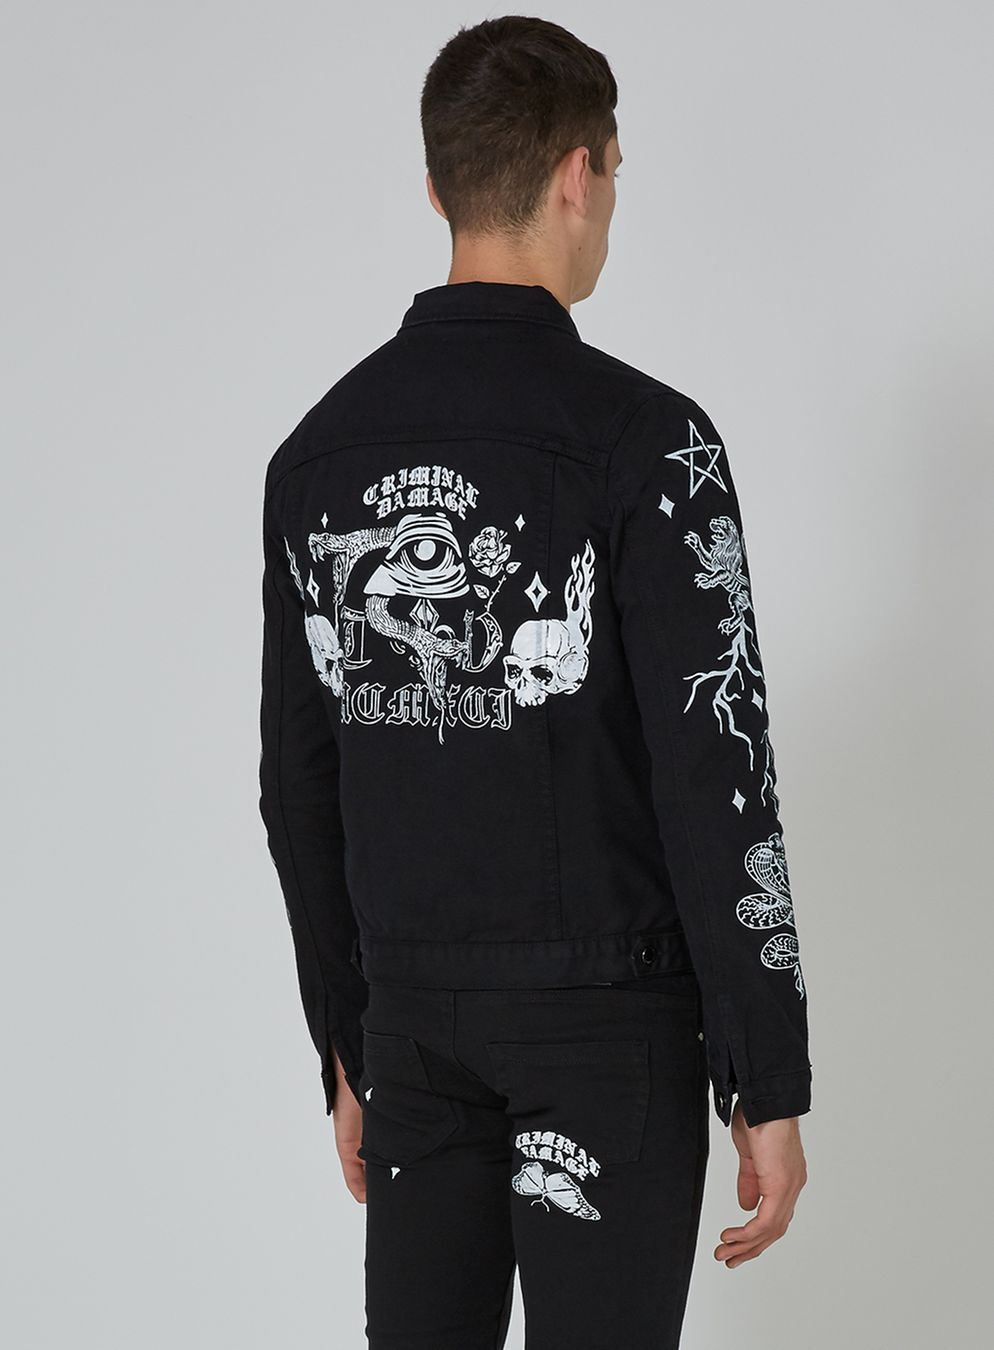 baffa229ff CRIMINAL DAMAGE S Black Printed Denim Jacket - New In - New In ...